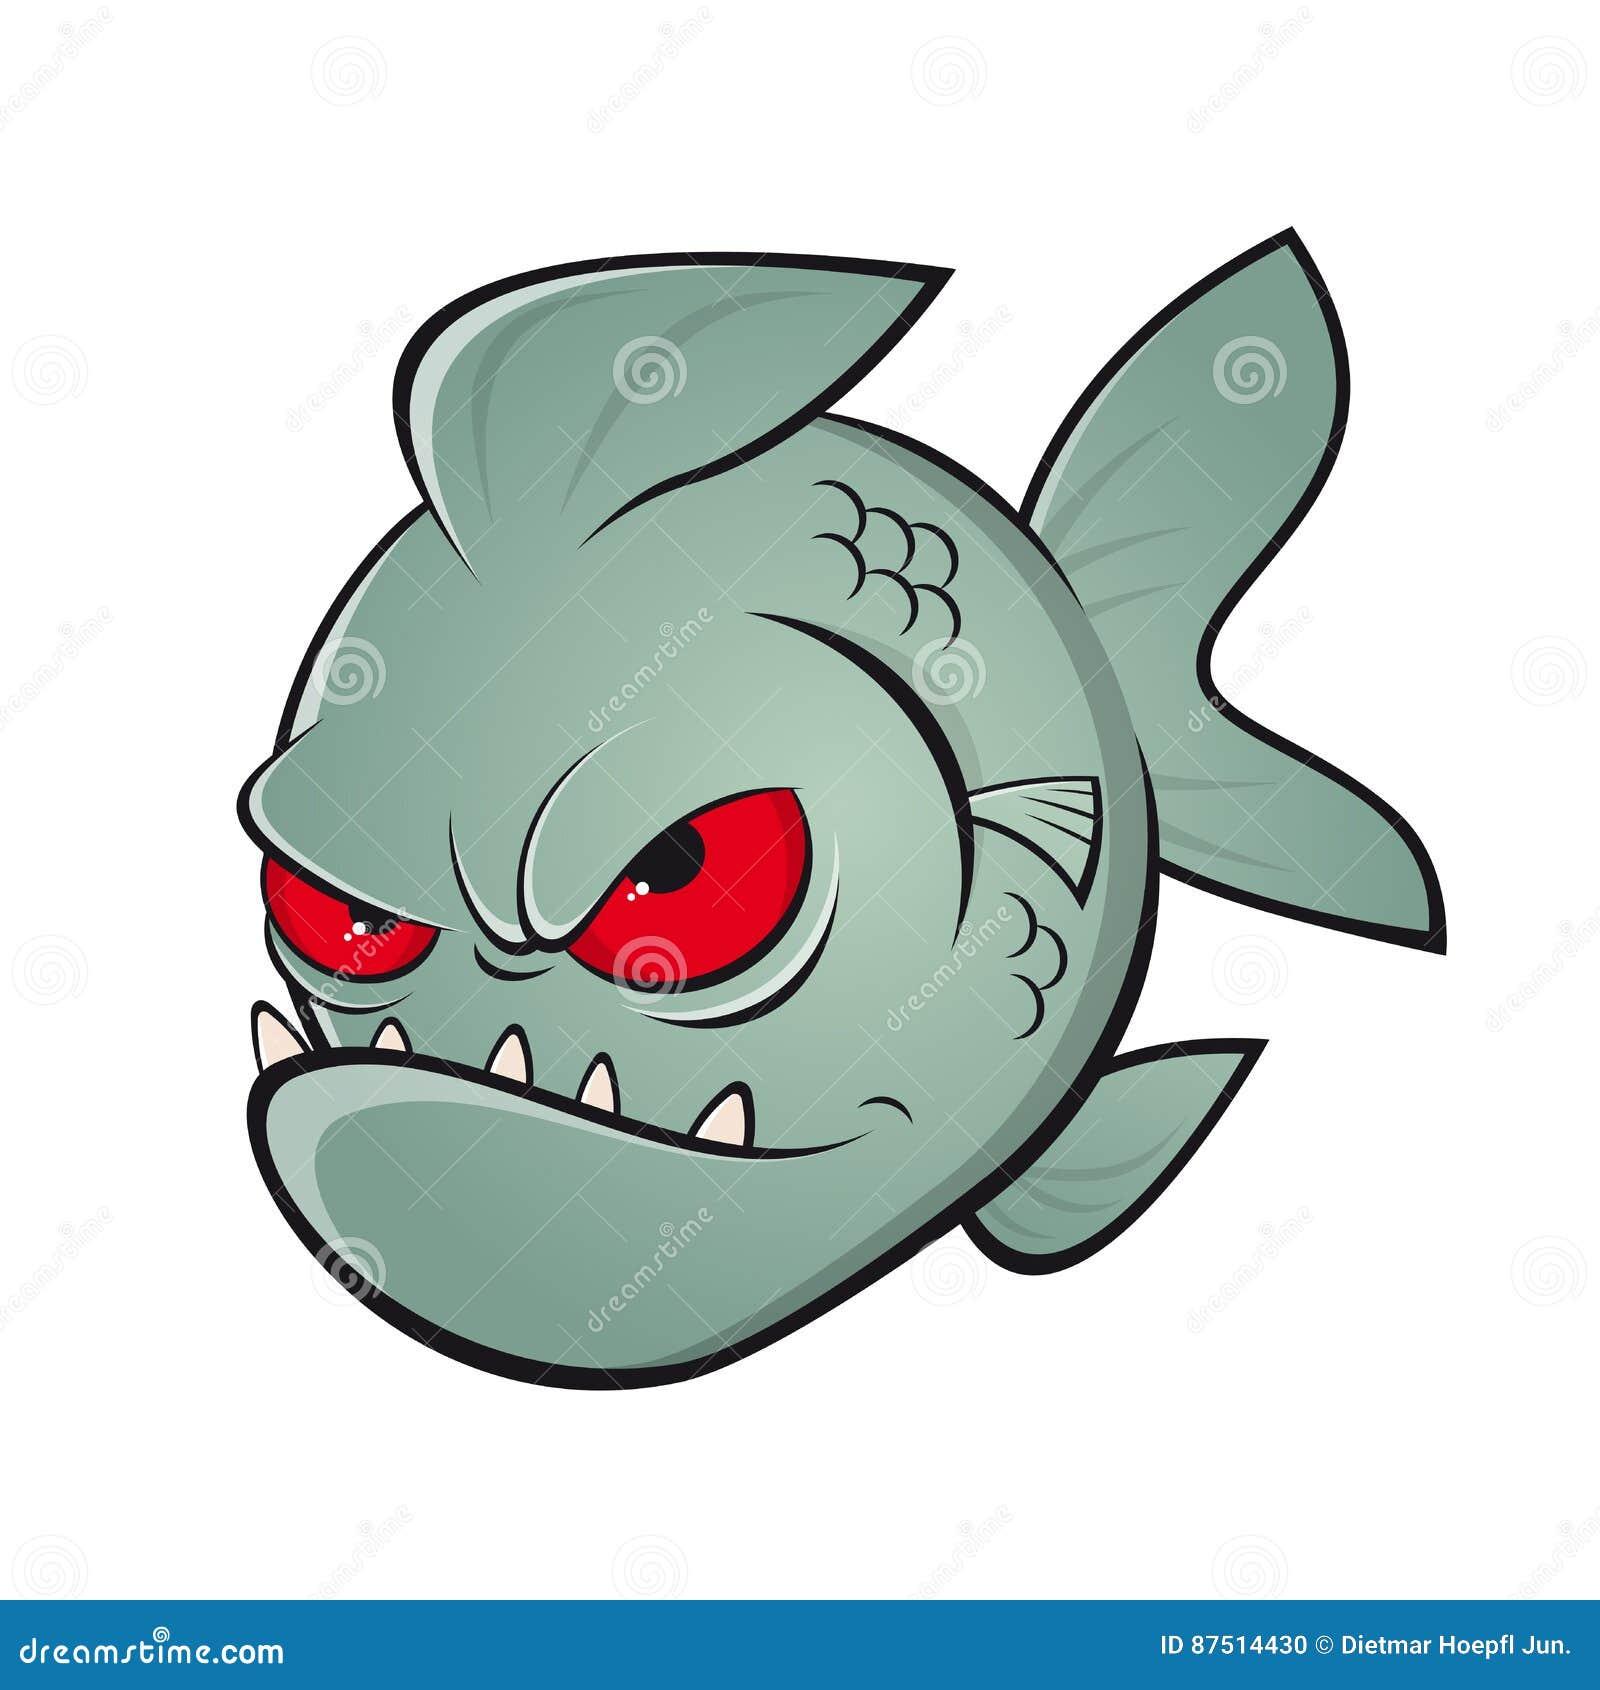 angry cartoon piranha stock vector illustration of dangerous 87514430 rh dreamstime com piranha plant clipart Printable Pictures of Piranhas